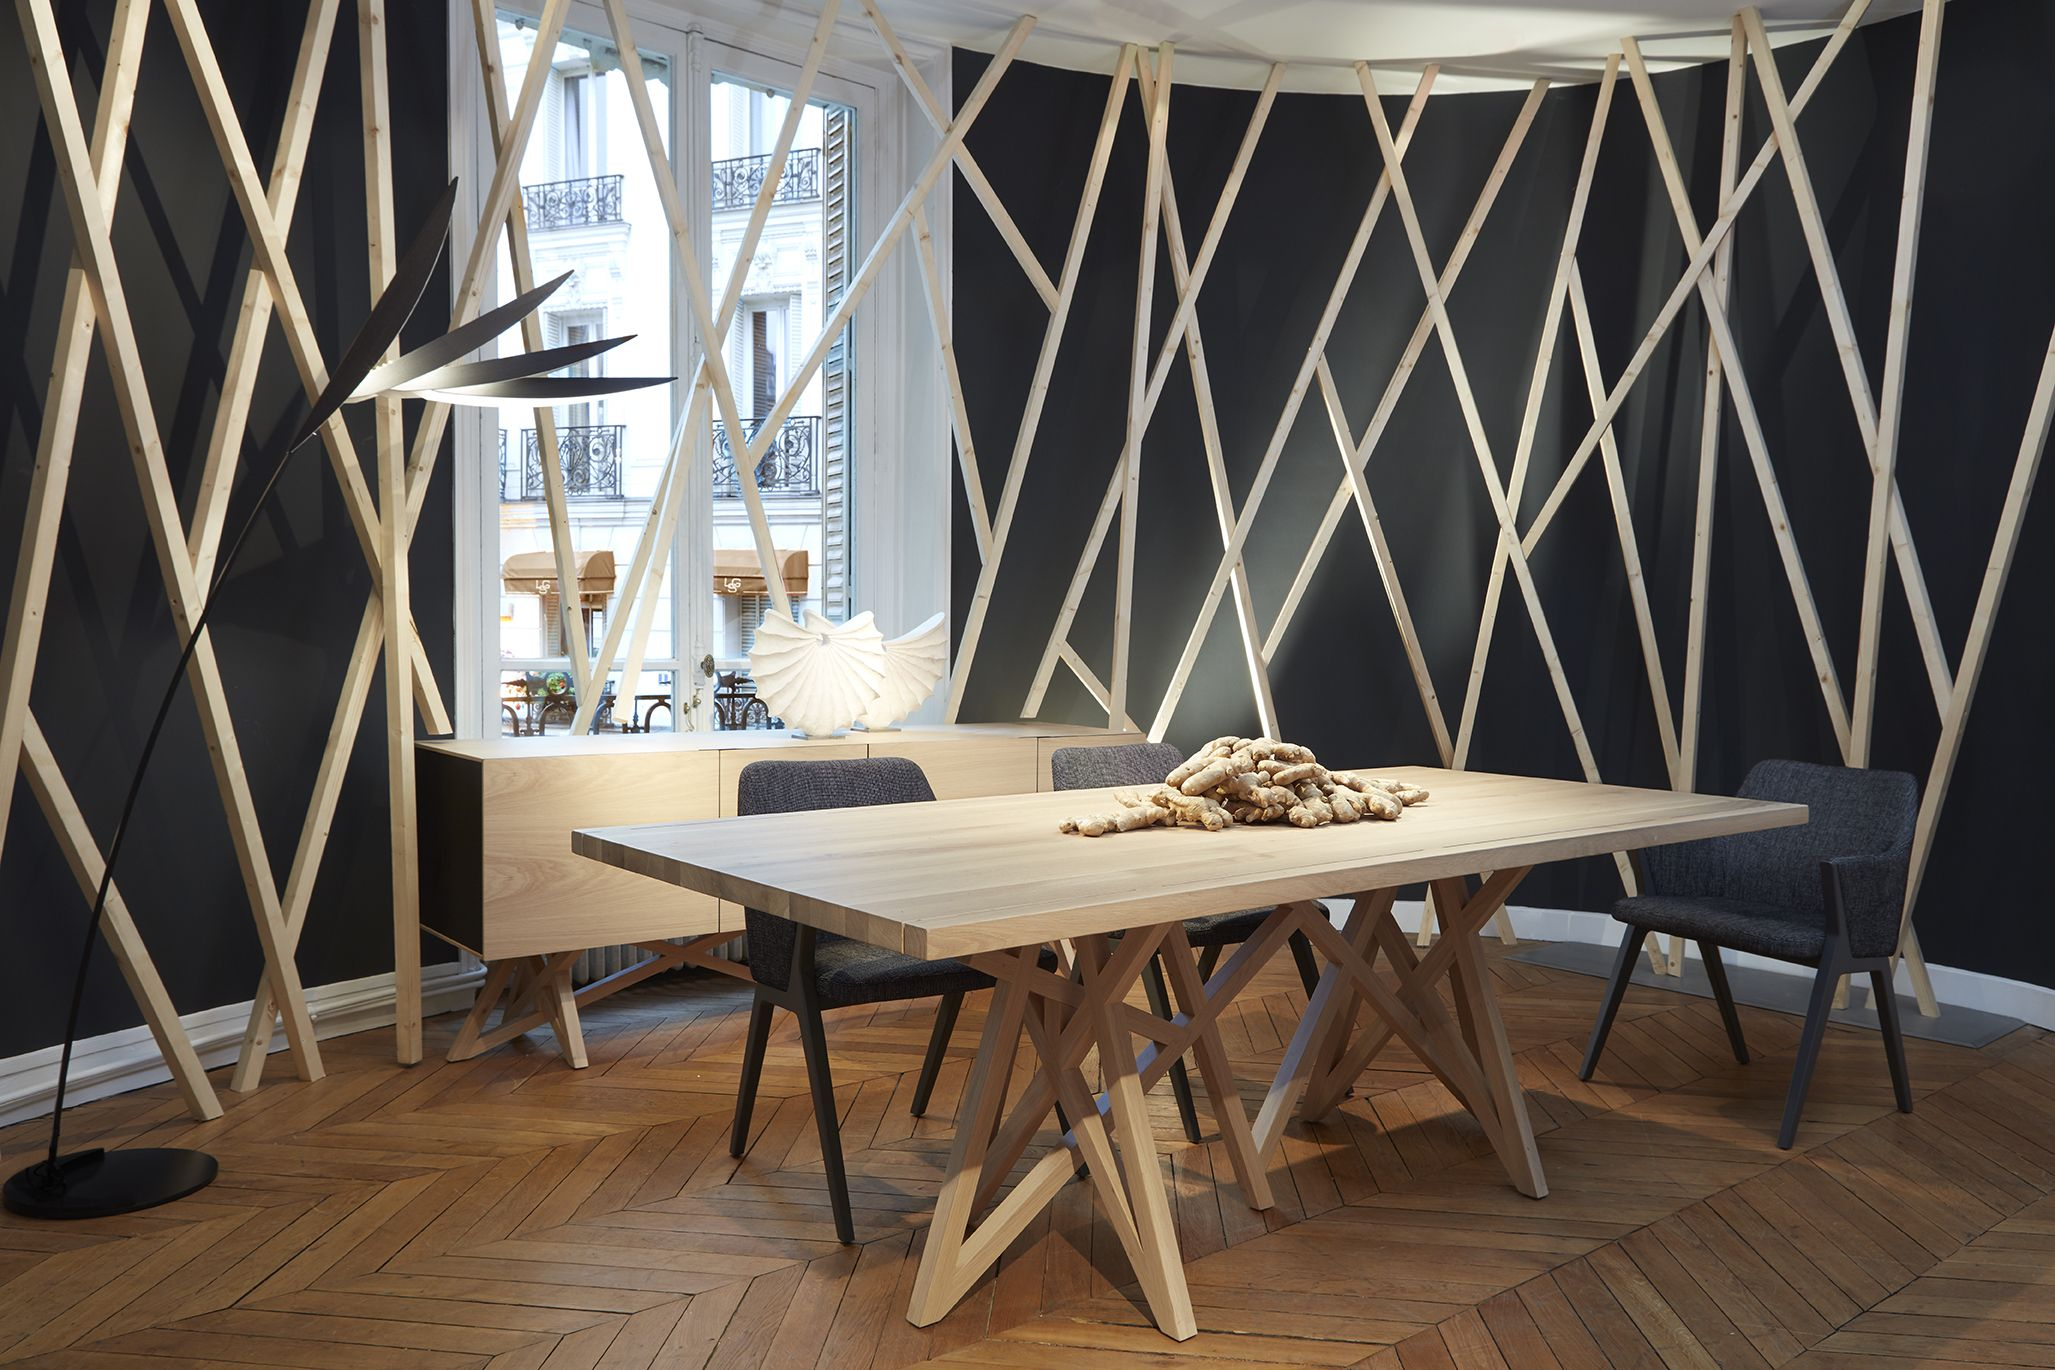 Roche Bobois   Designer's Days In Paris, France   2016 concernant Table Salle À Manger Roche Bobois